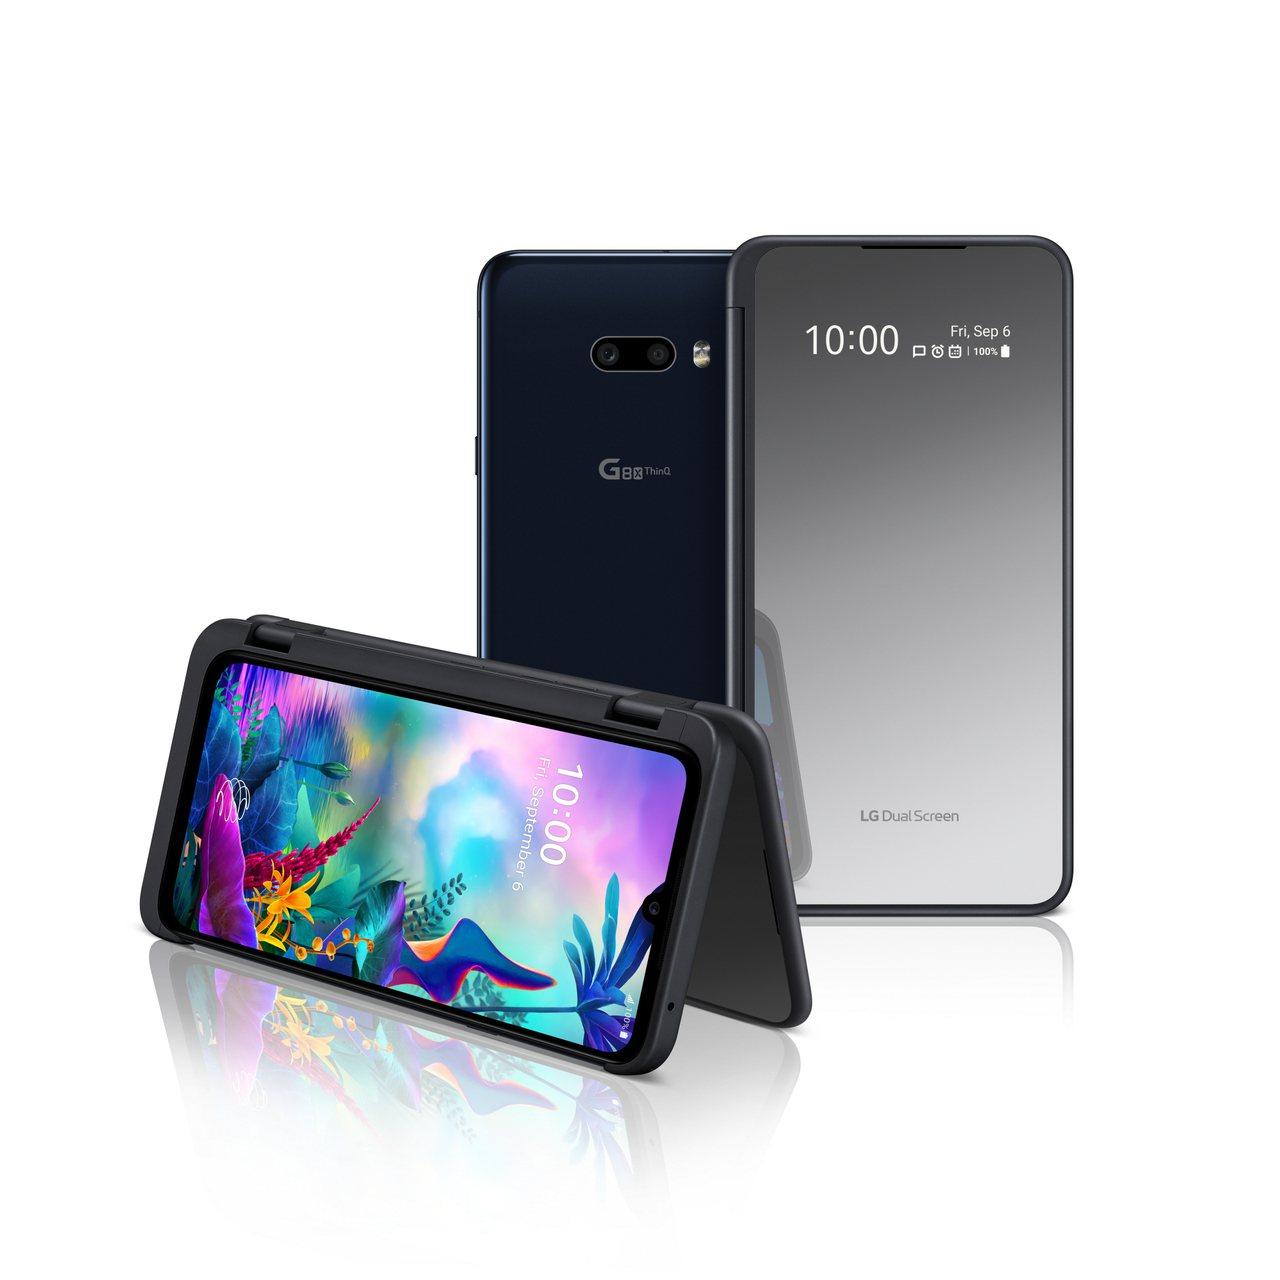 LG於IFA發表G系列最新款智慧型手機LG G8XThinQ,與技術更升級的雙螢...